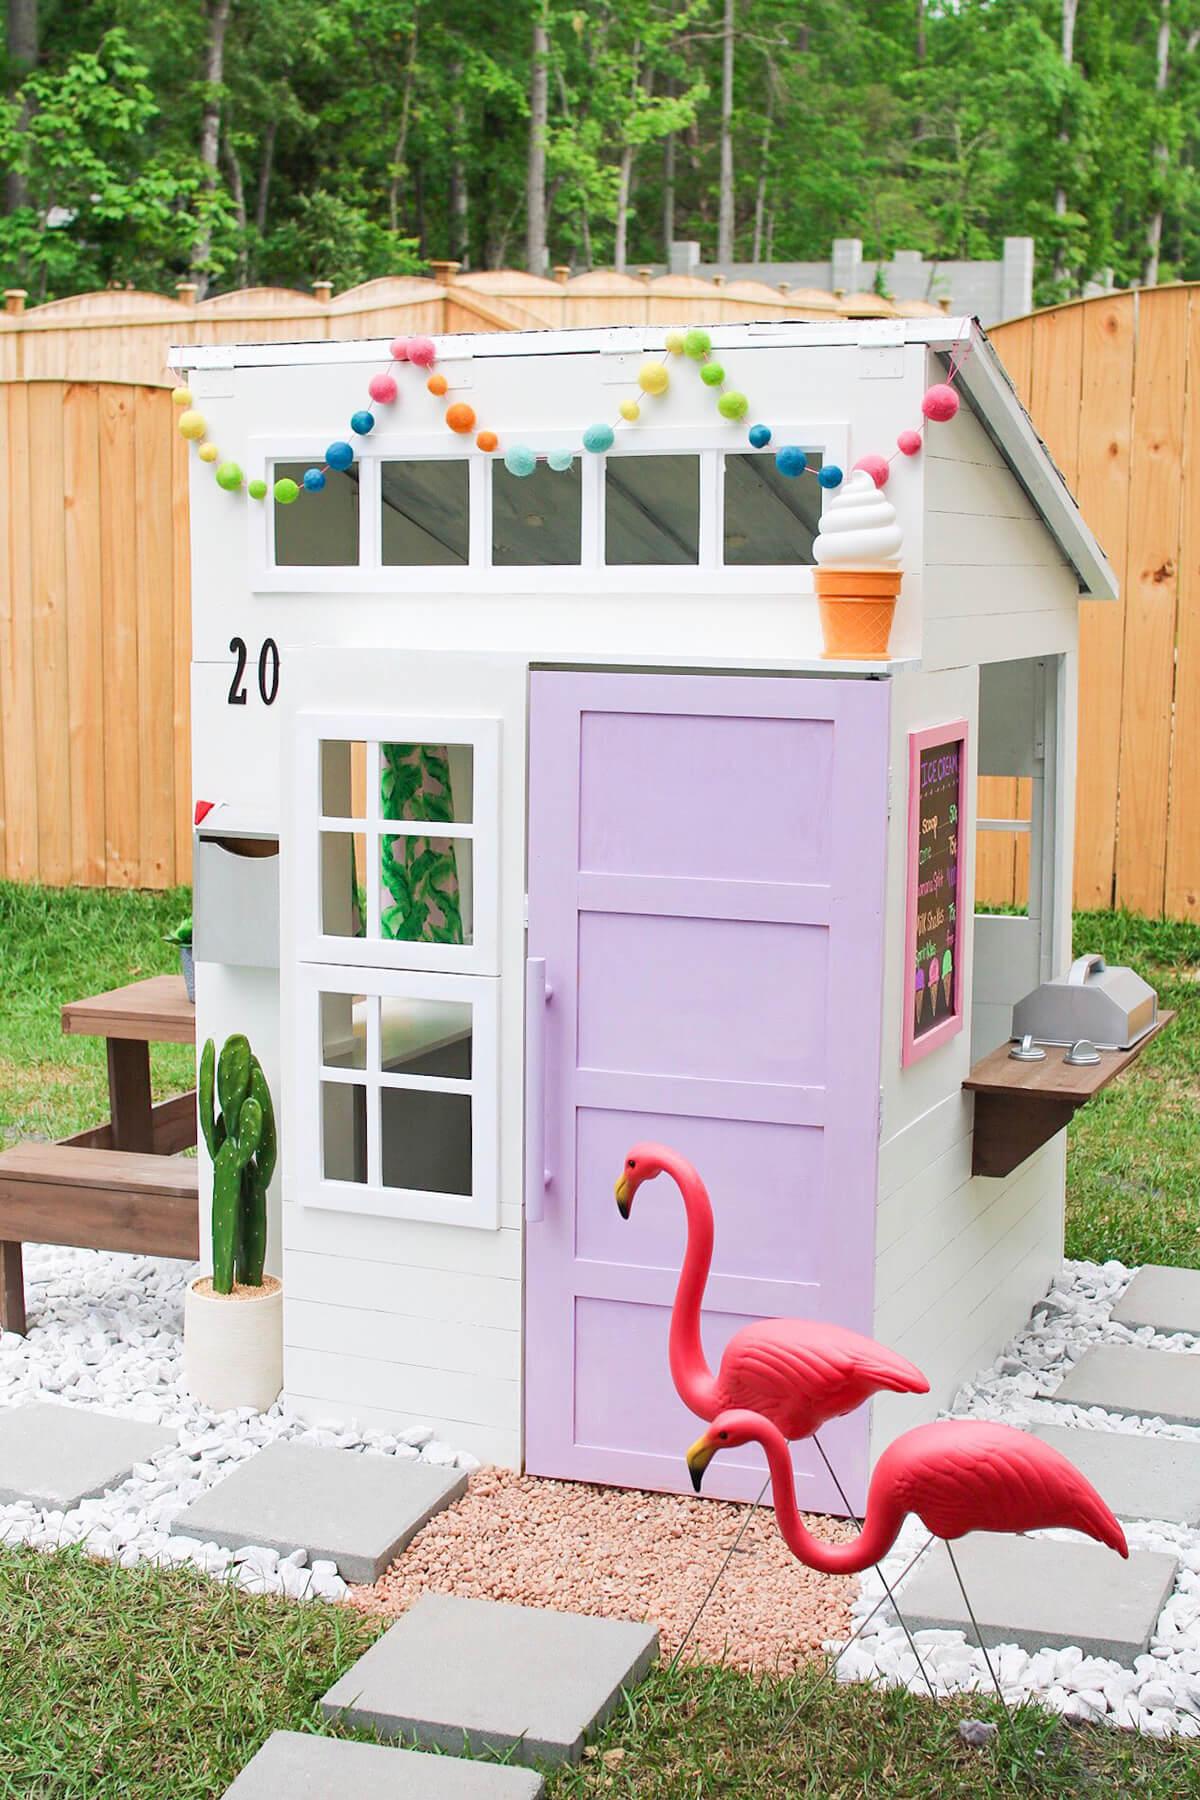 Sweet DIY Ice Cream Shop Playhouse